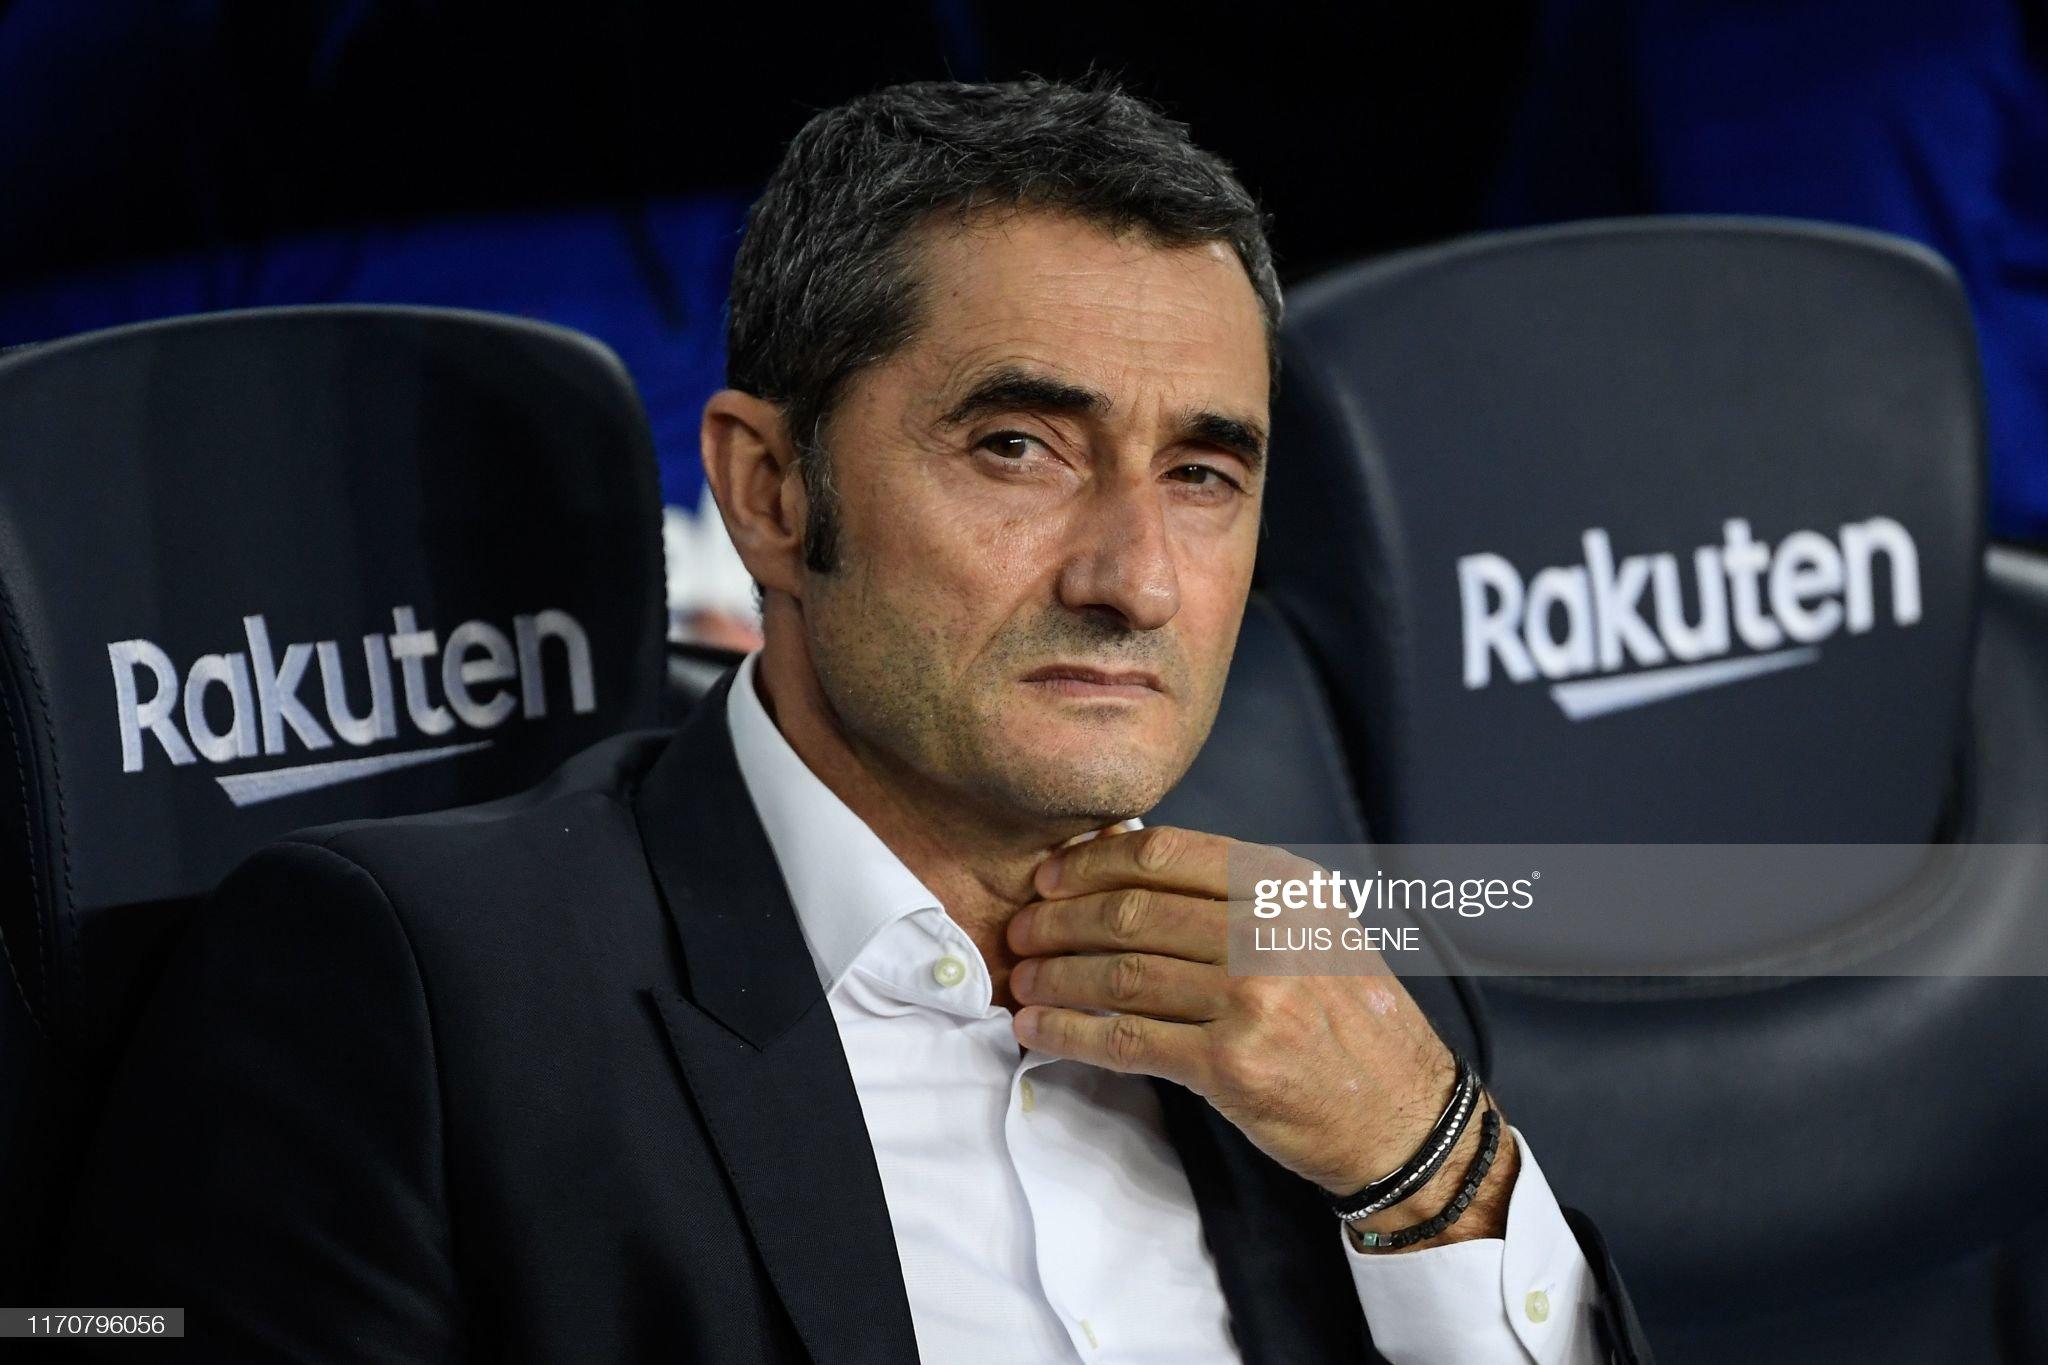 صور مباراة : برشلونة - فياريال 2-1 ( 24-09-2019 )  Barcelonas-spanish-coach-ernesto-valverde-looks-on-prior-to-the-picture-id1170796056?s=2048x2048